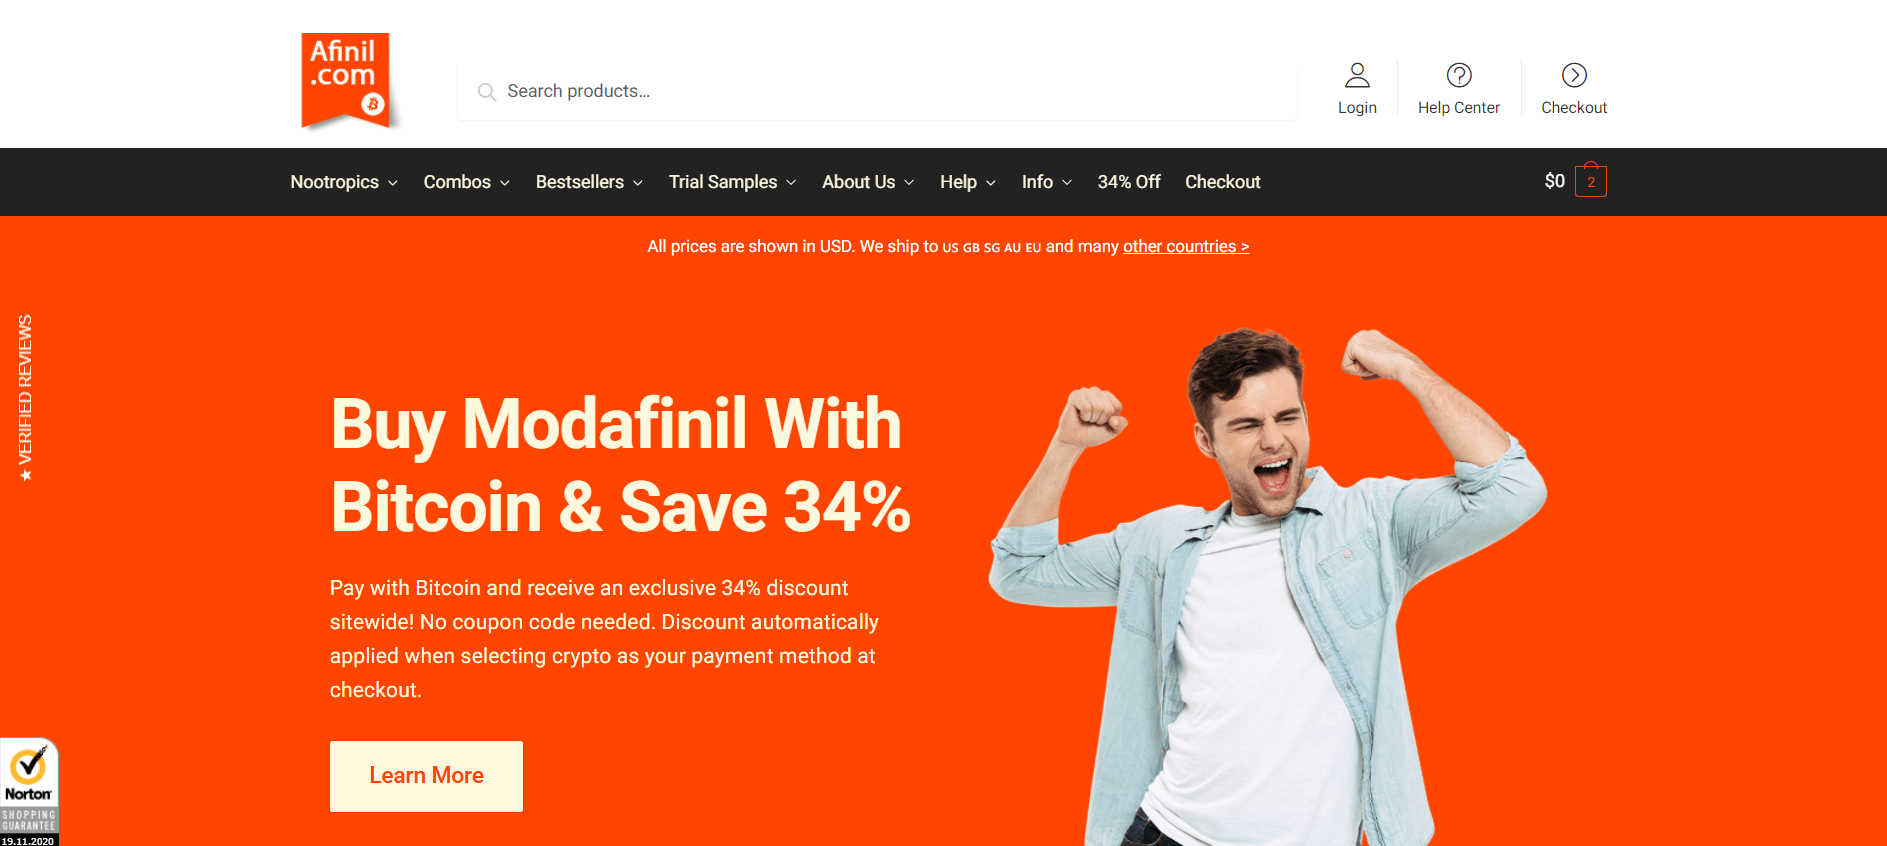 Afinil Online Pharmacy Review